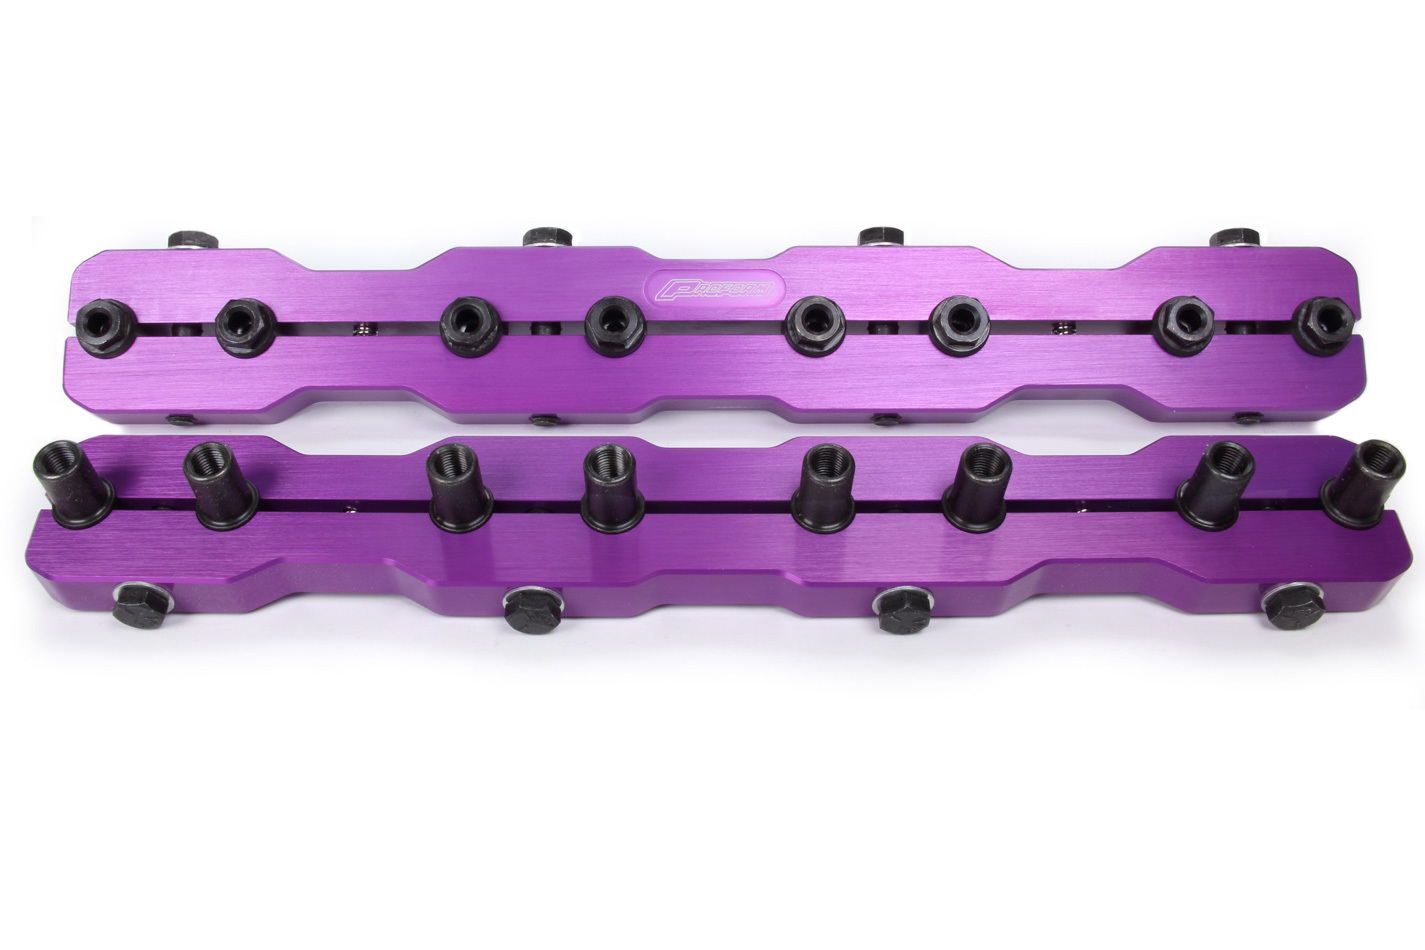 Proform 66950 Rocker Arm Stud Girdle, 3/8-24 in Thread Studs, Aluminum, Purple Anodized, Small Block Chevy, Kit